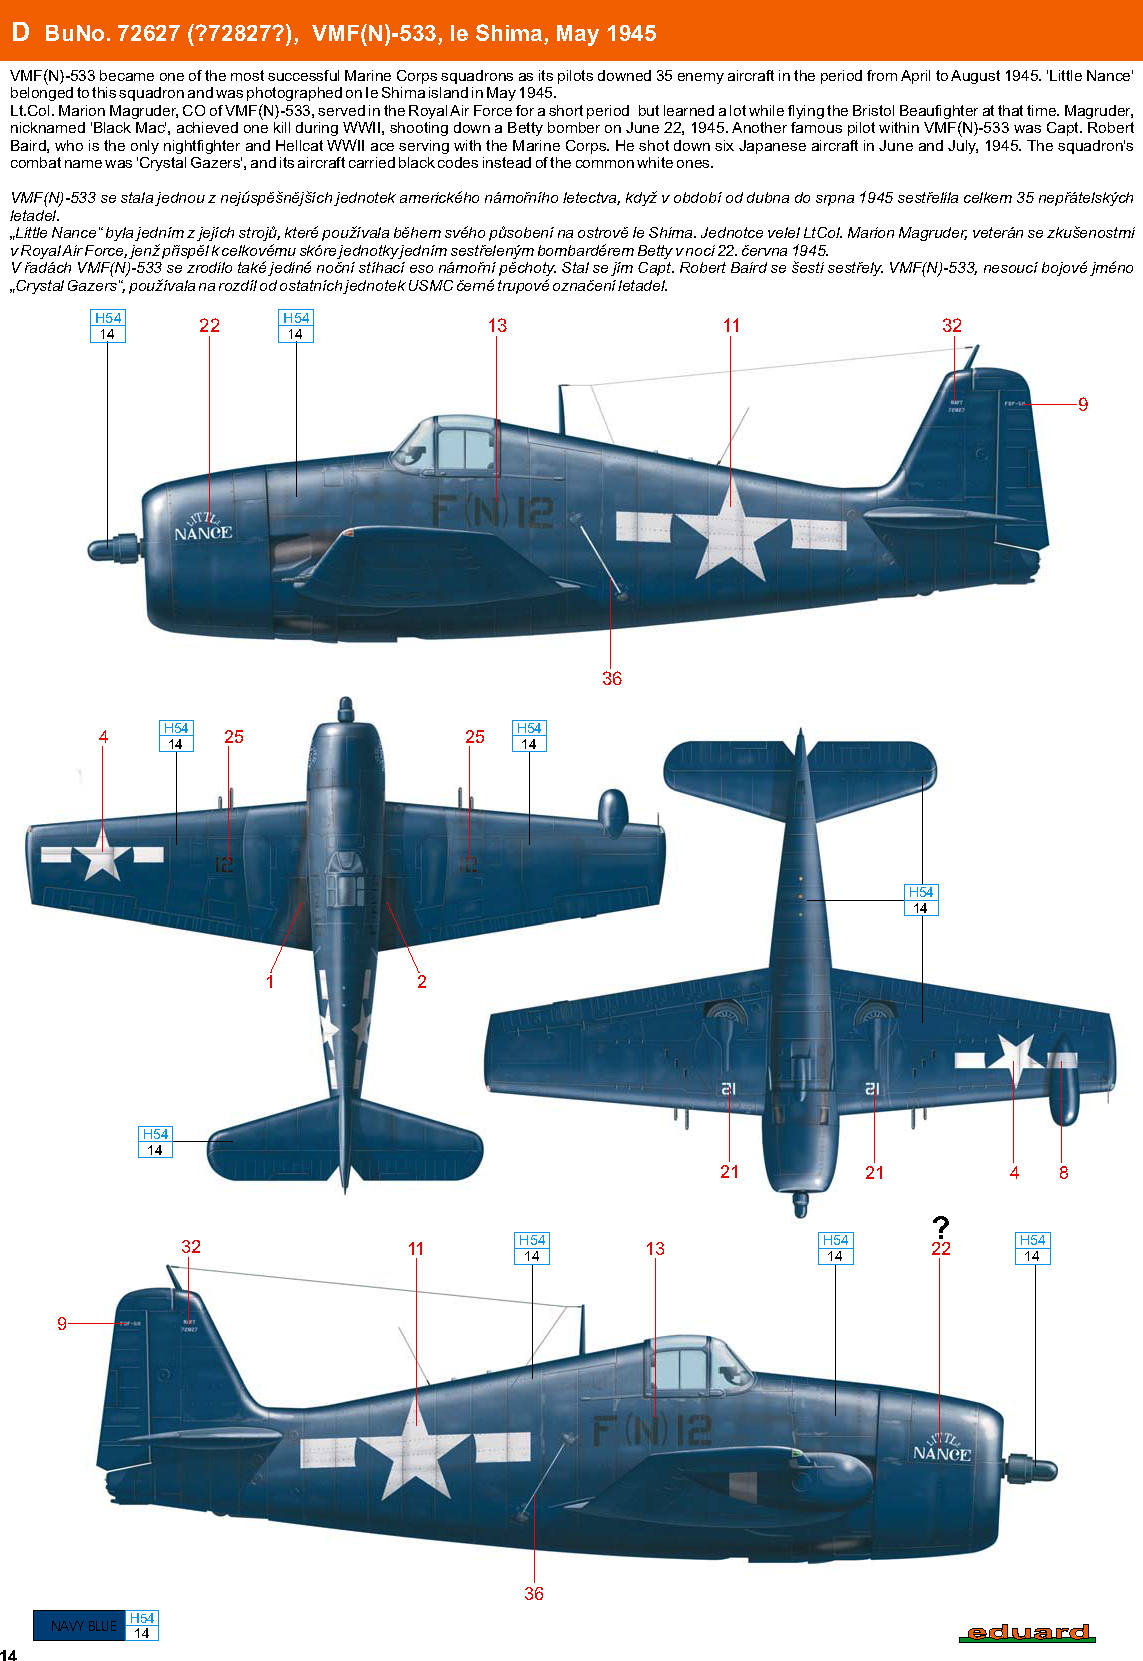 Grumman F6F 5N Hellcat VMFN 533 F(N)12 Little Nance BuNo 72627 Ie Shima May 1945 0A